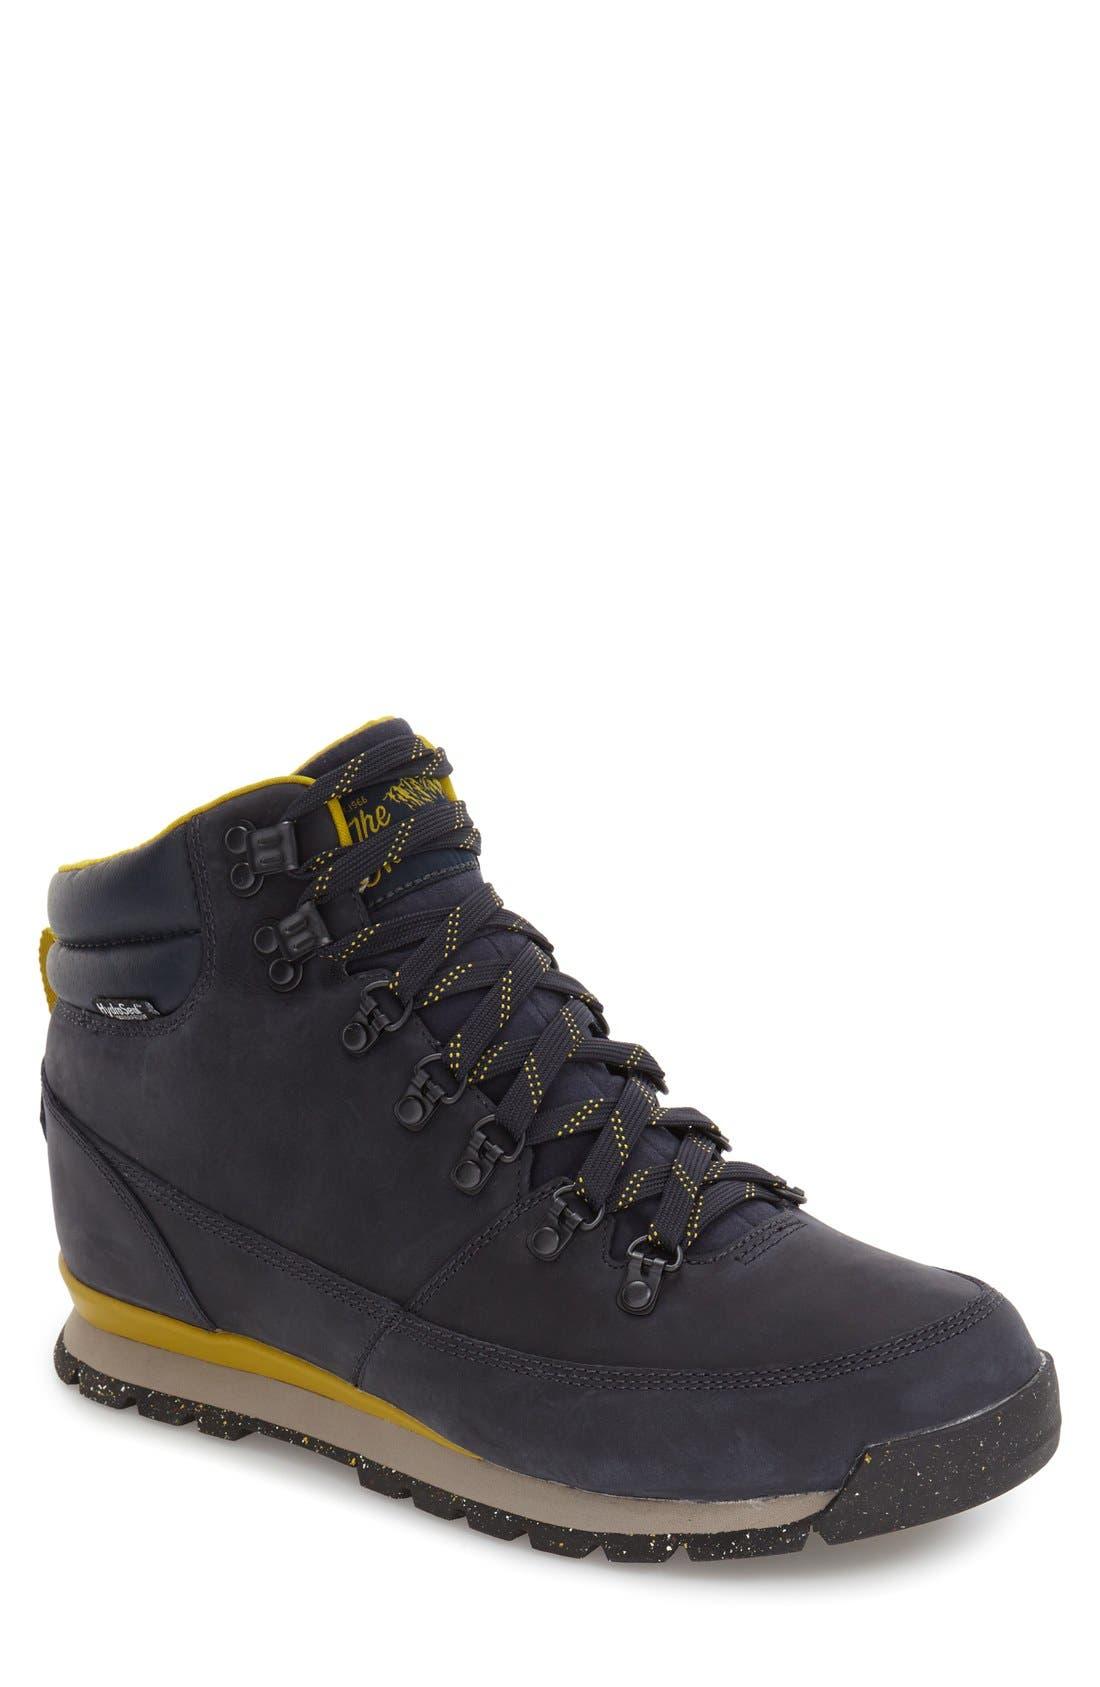 Main Image - The North Face 'Back to Berkeley Redux' Waterproof Boot (Men)